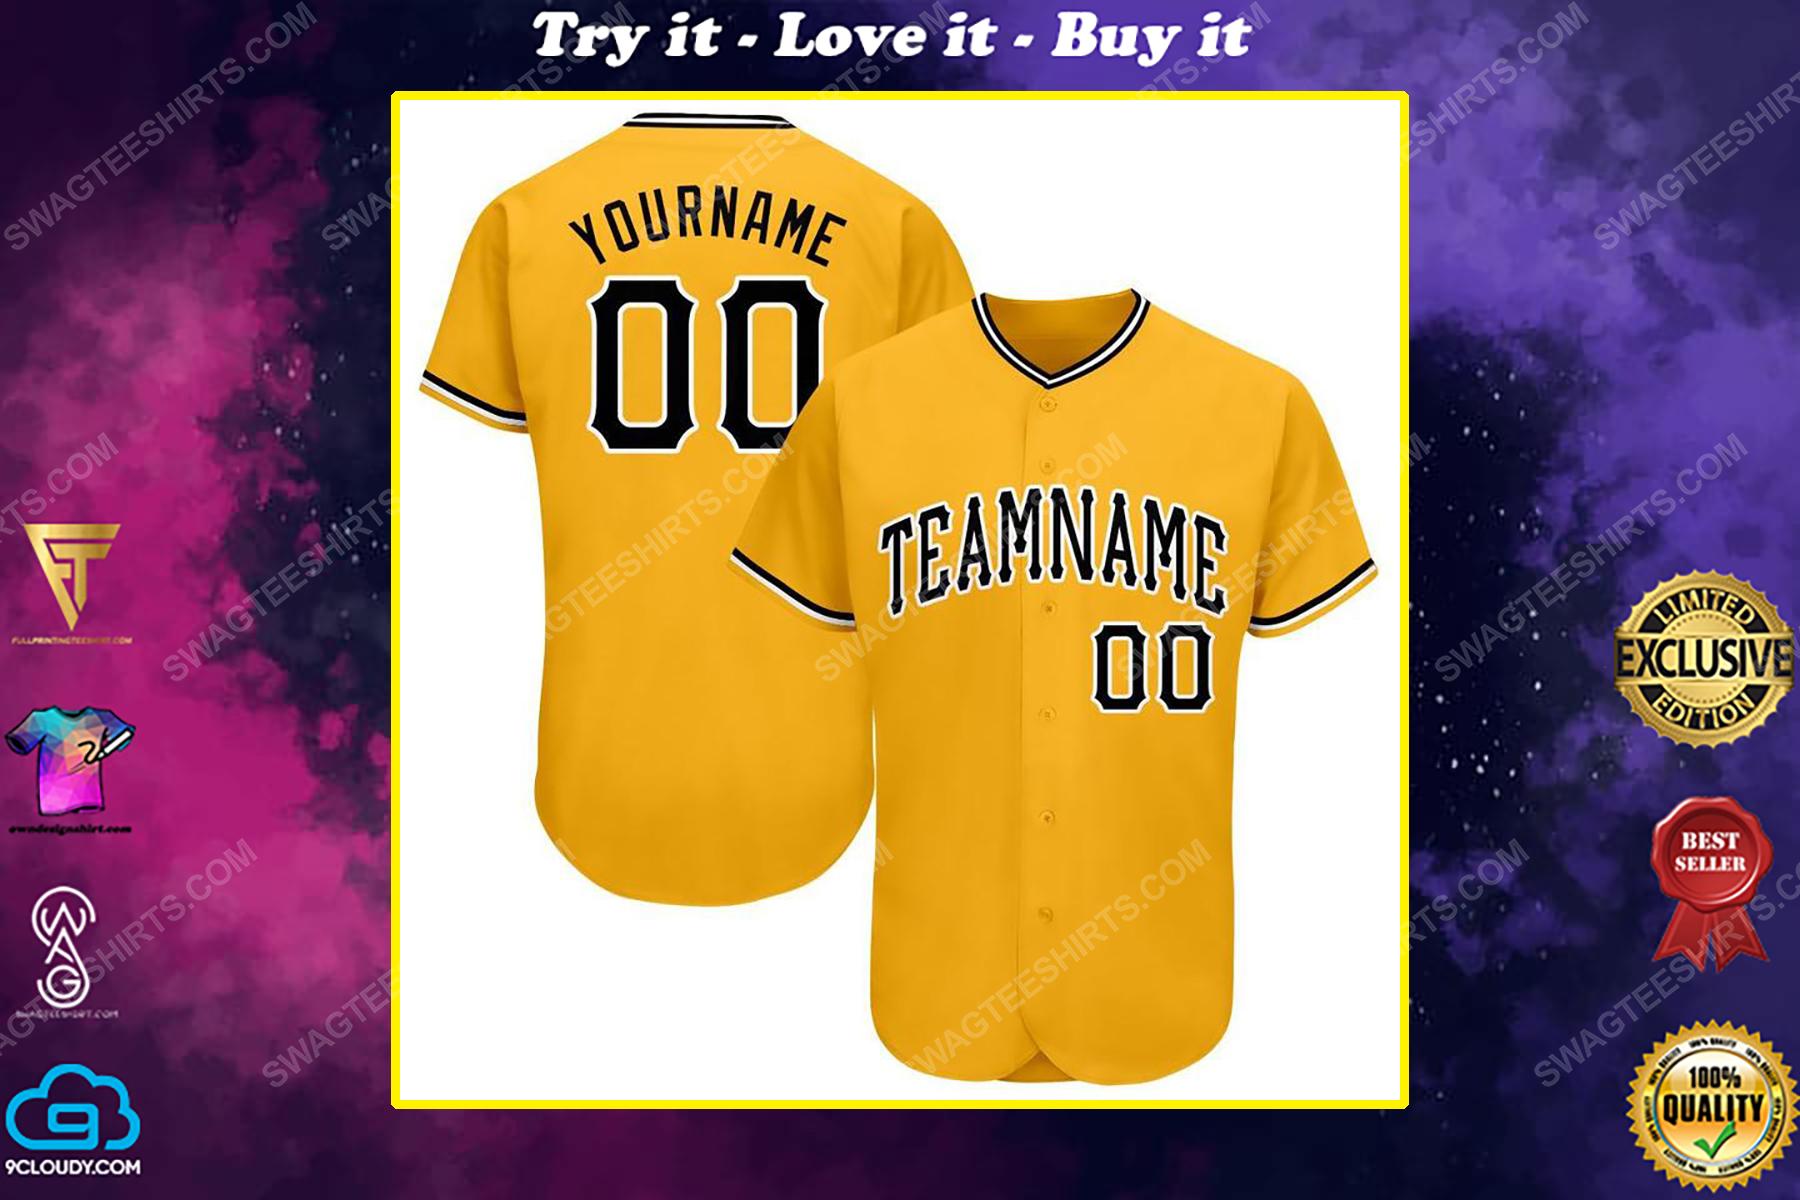 Custom team name pittsburgh pirates mlb full printed baseball jersey